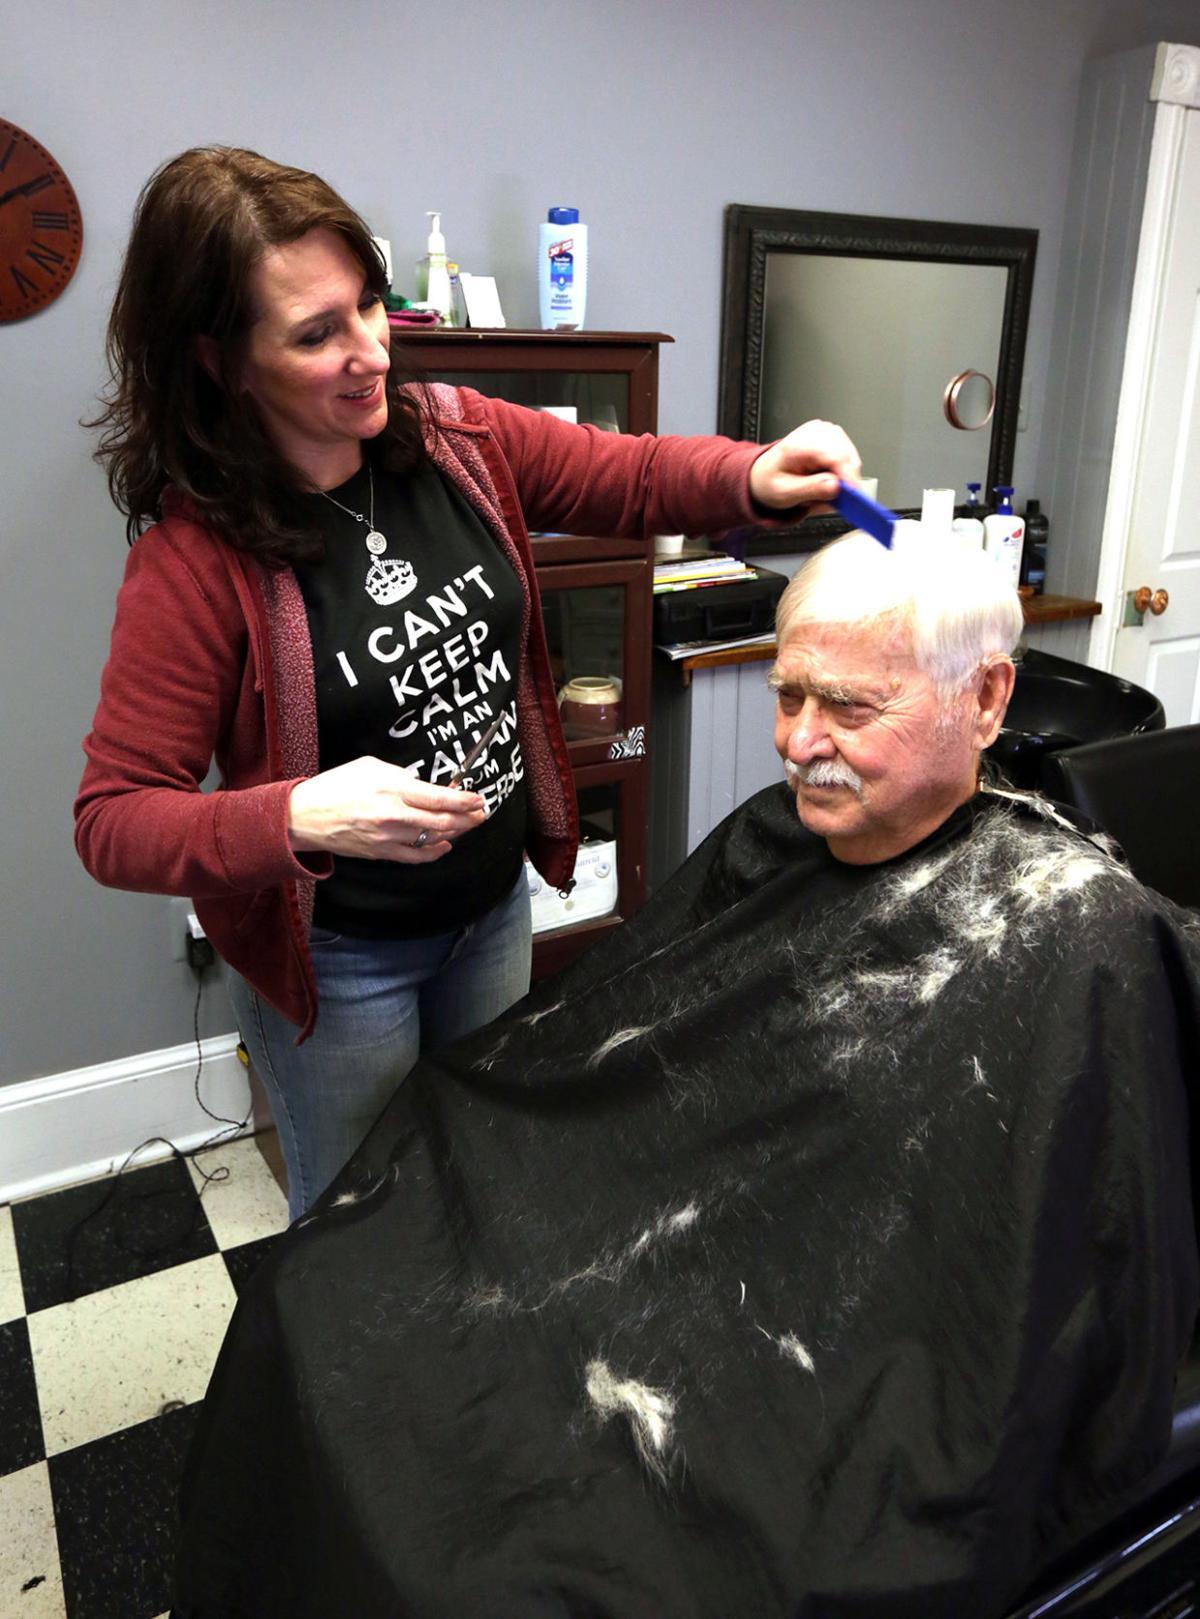 Barber Shop Hamilton Nj : Hamilton Township hopes tax incentives help historic district ...